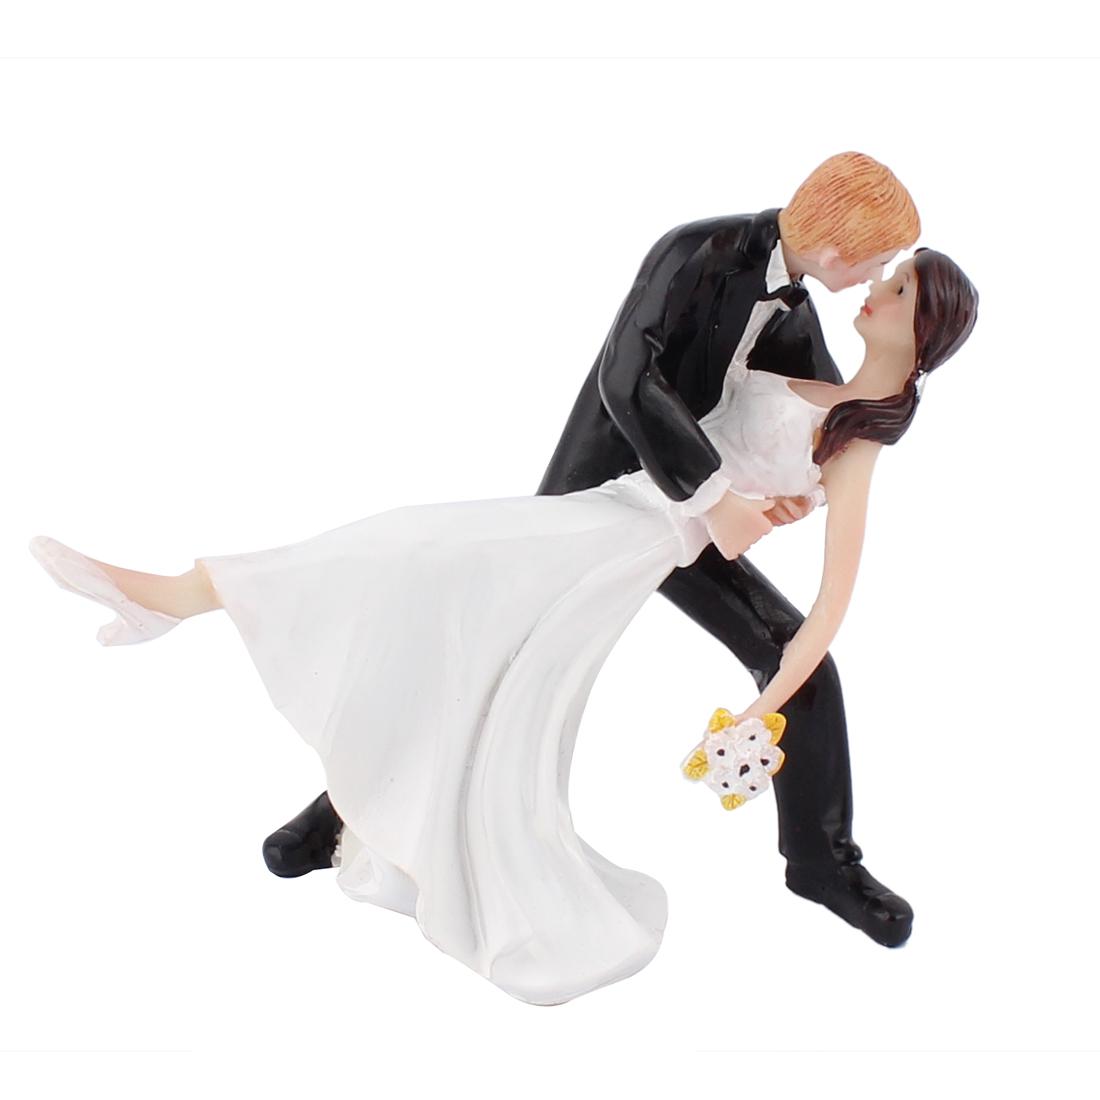 Bride Groom Couple Dancing Dip Hug Figurine Wedding Cake Topper Decoration Gift